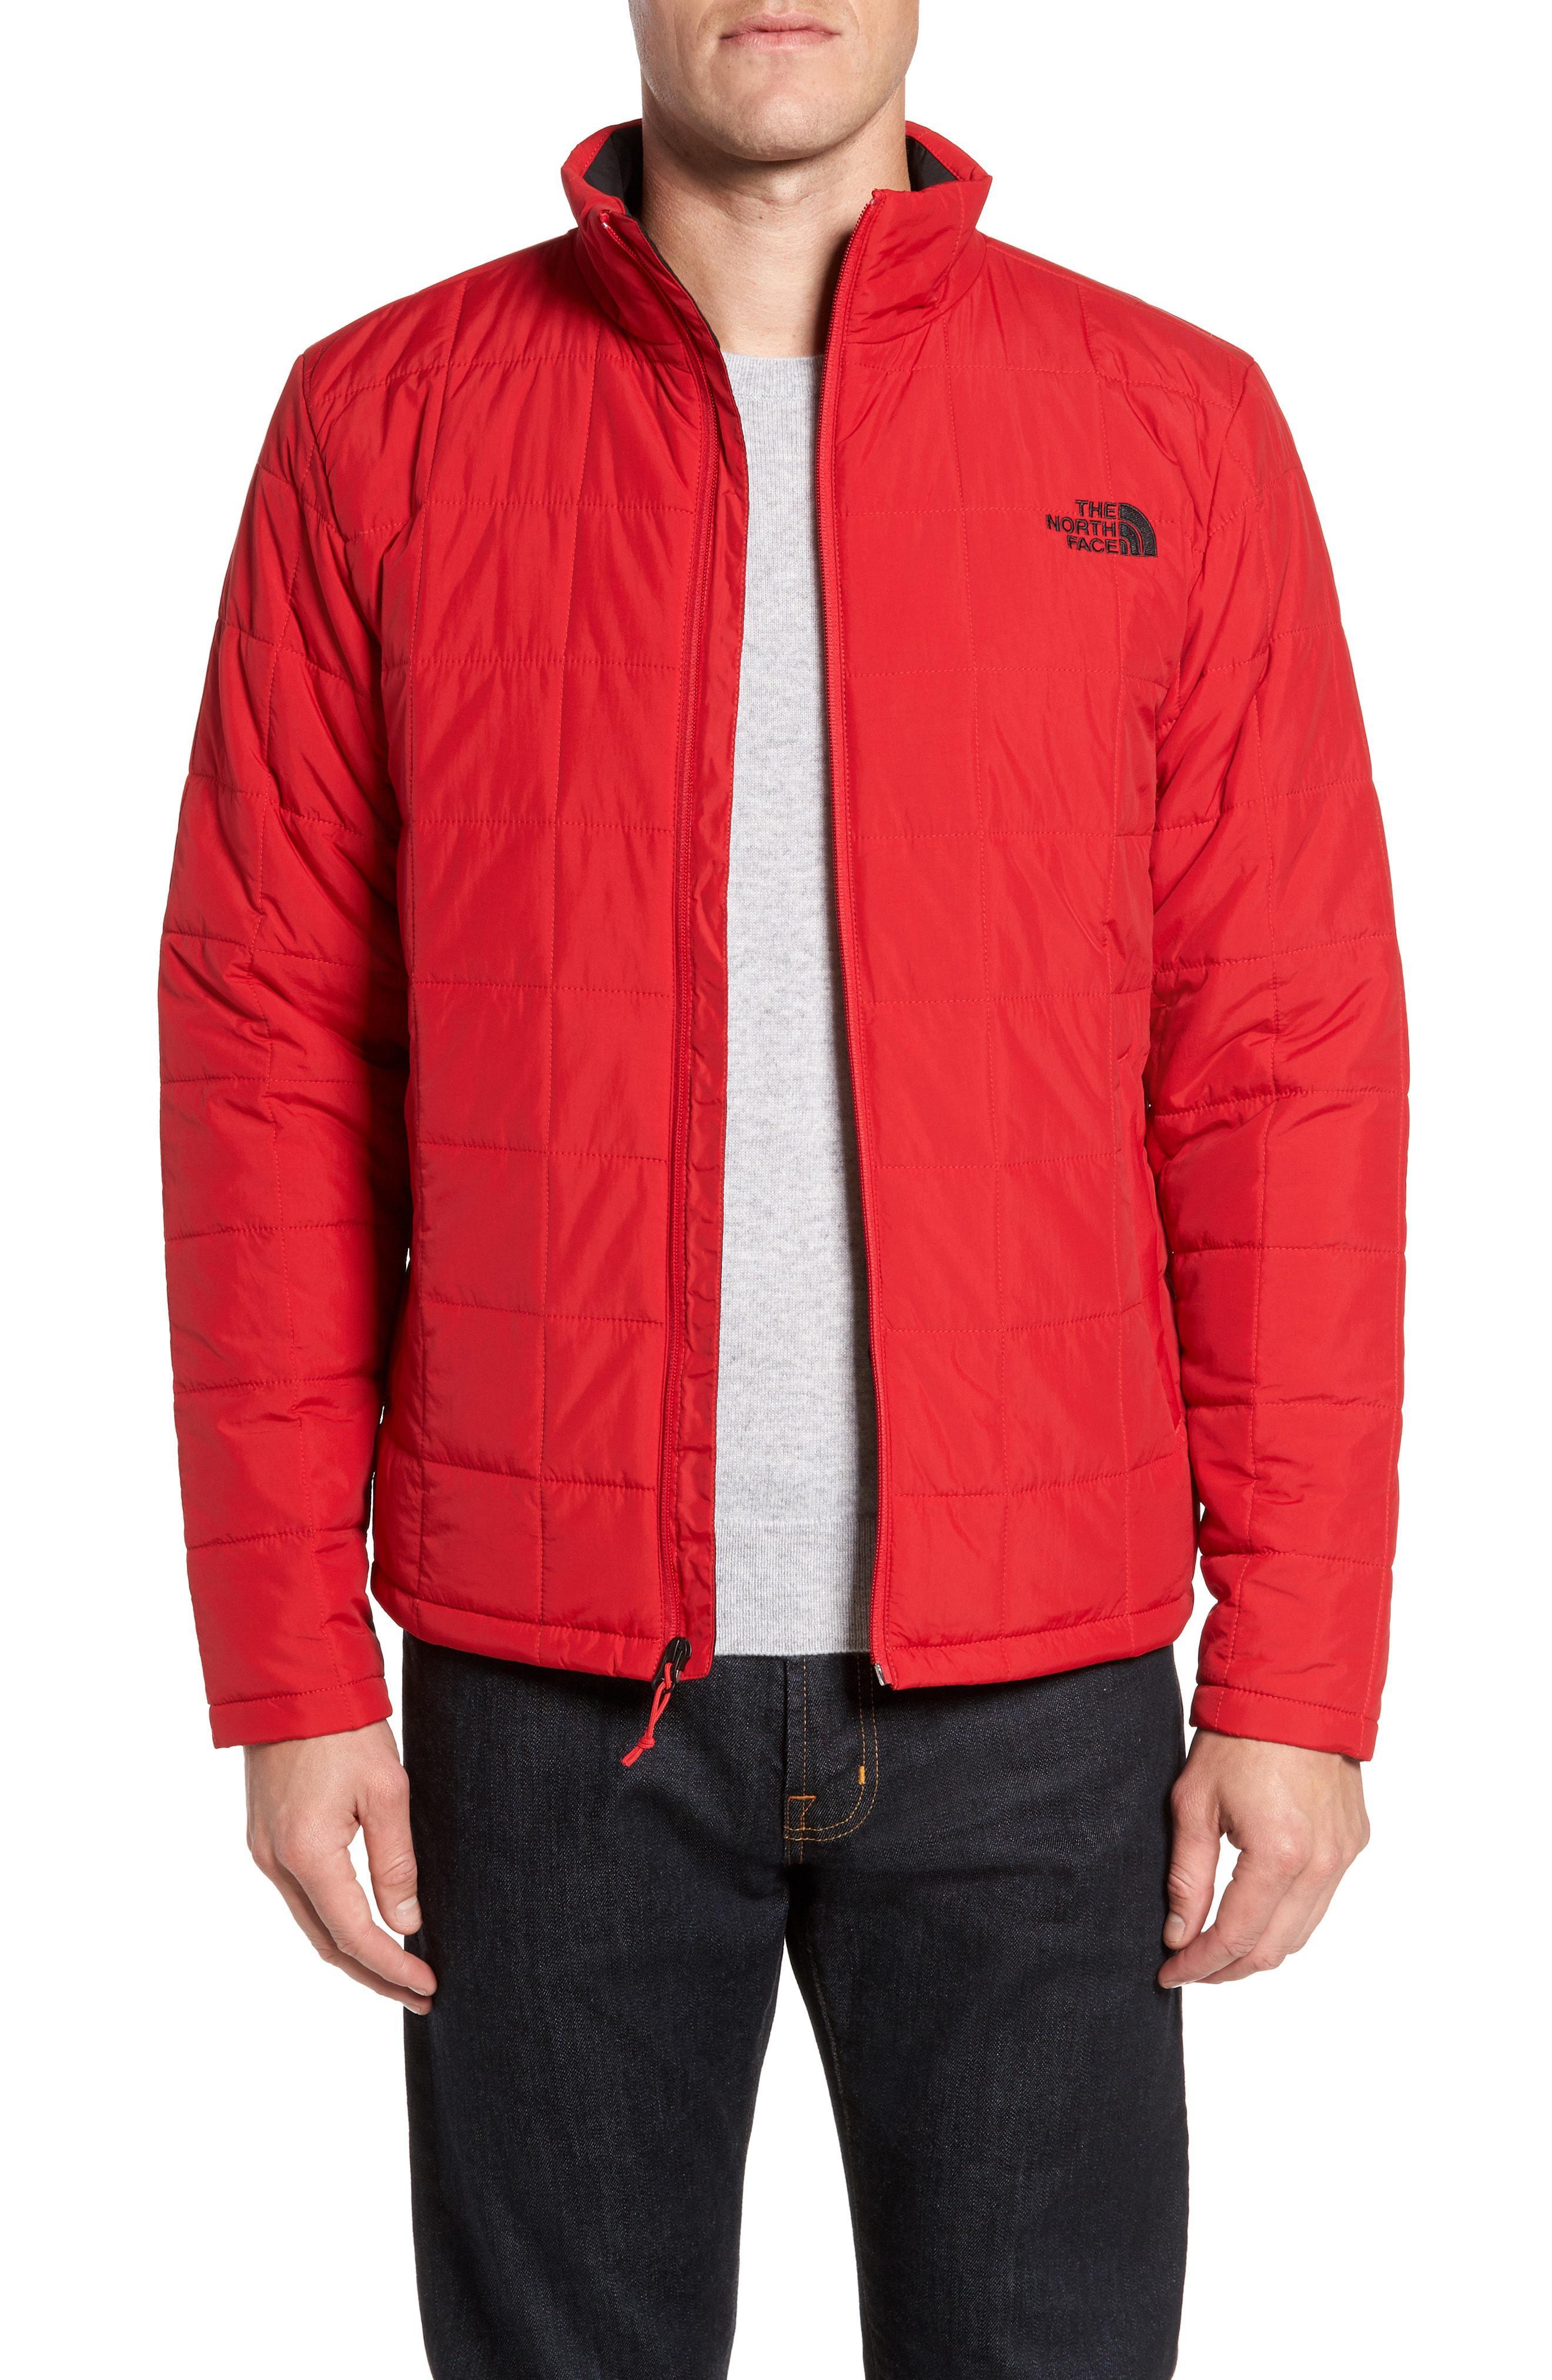 The North Face Harway Heatseaker(tm) Jacket for Men - Lyst 91cde8d3b